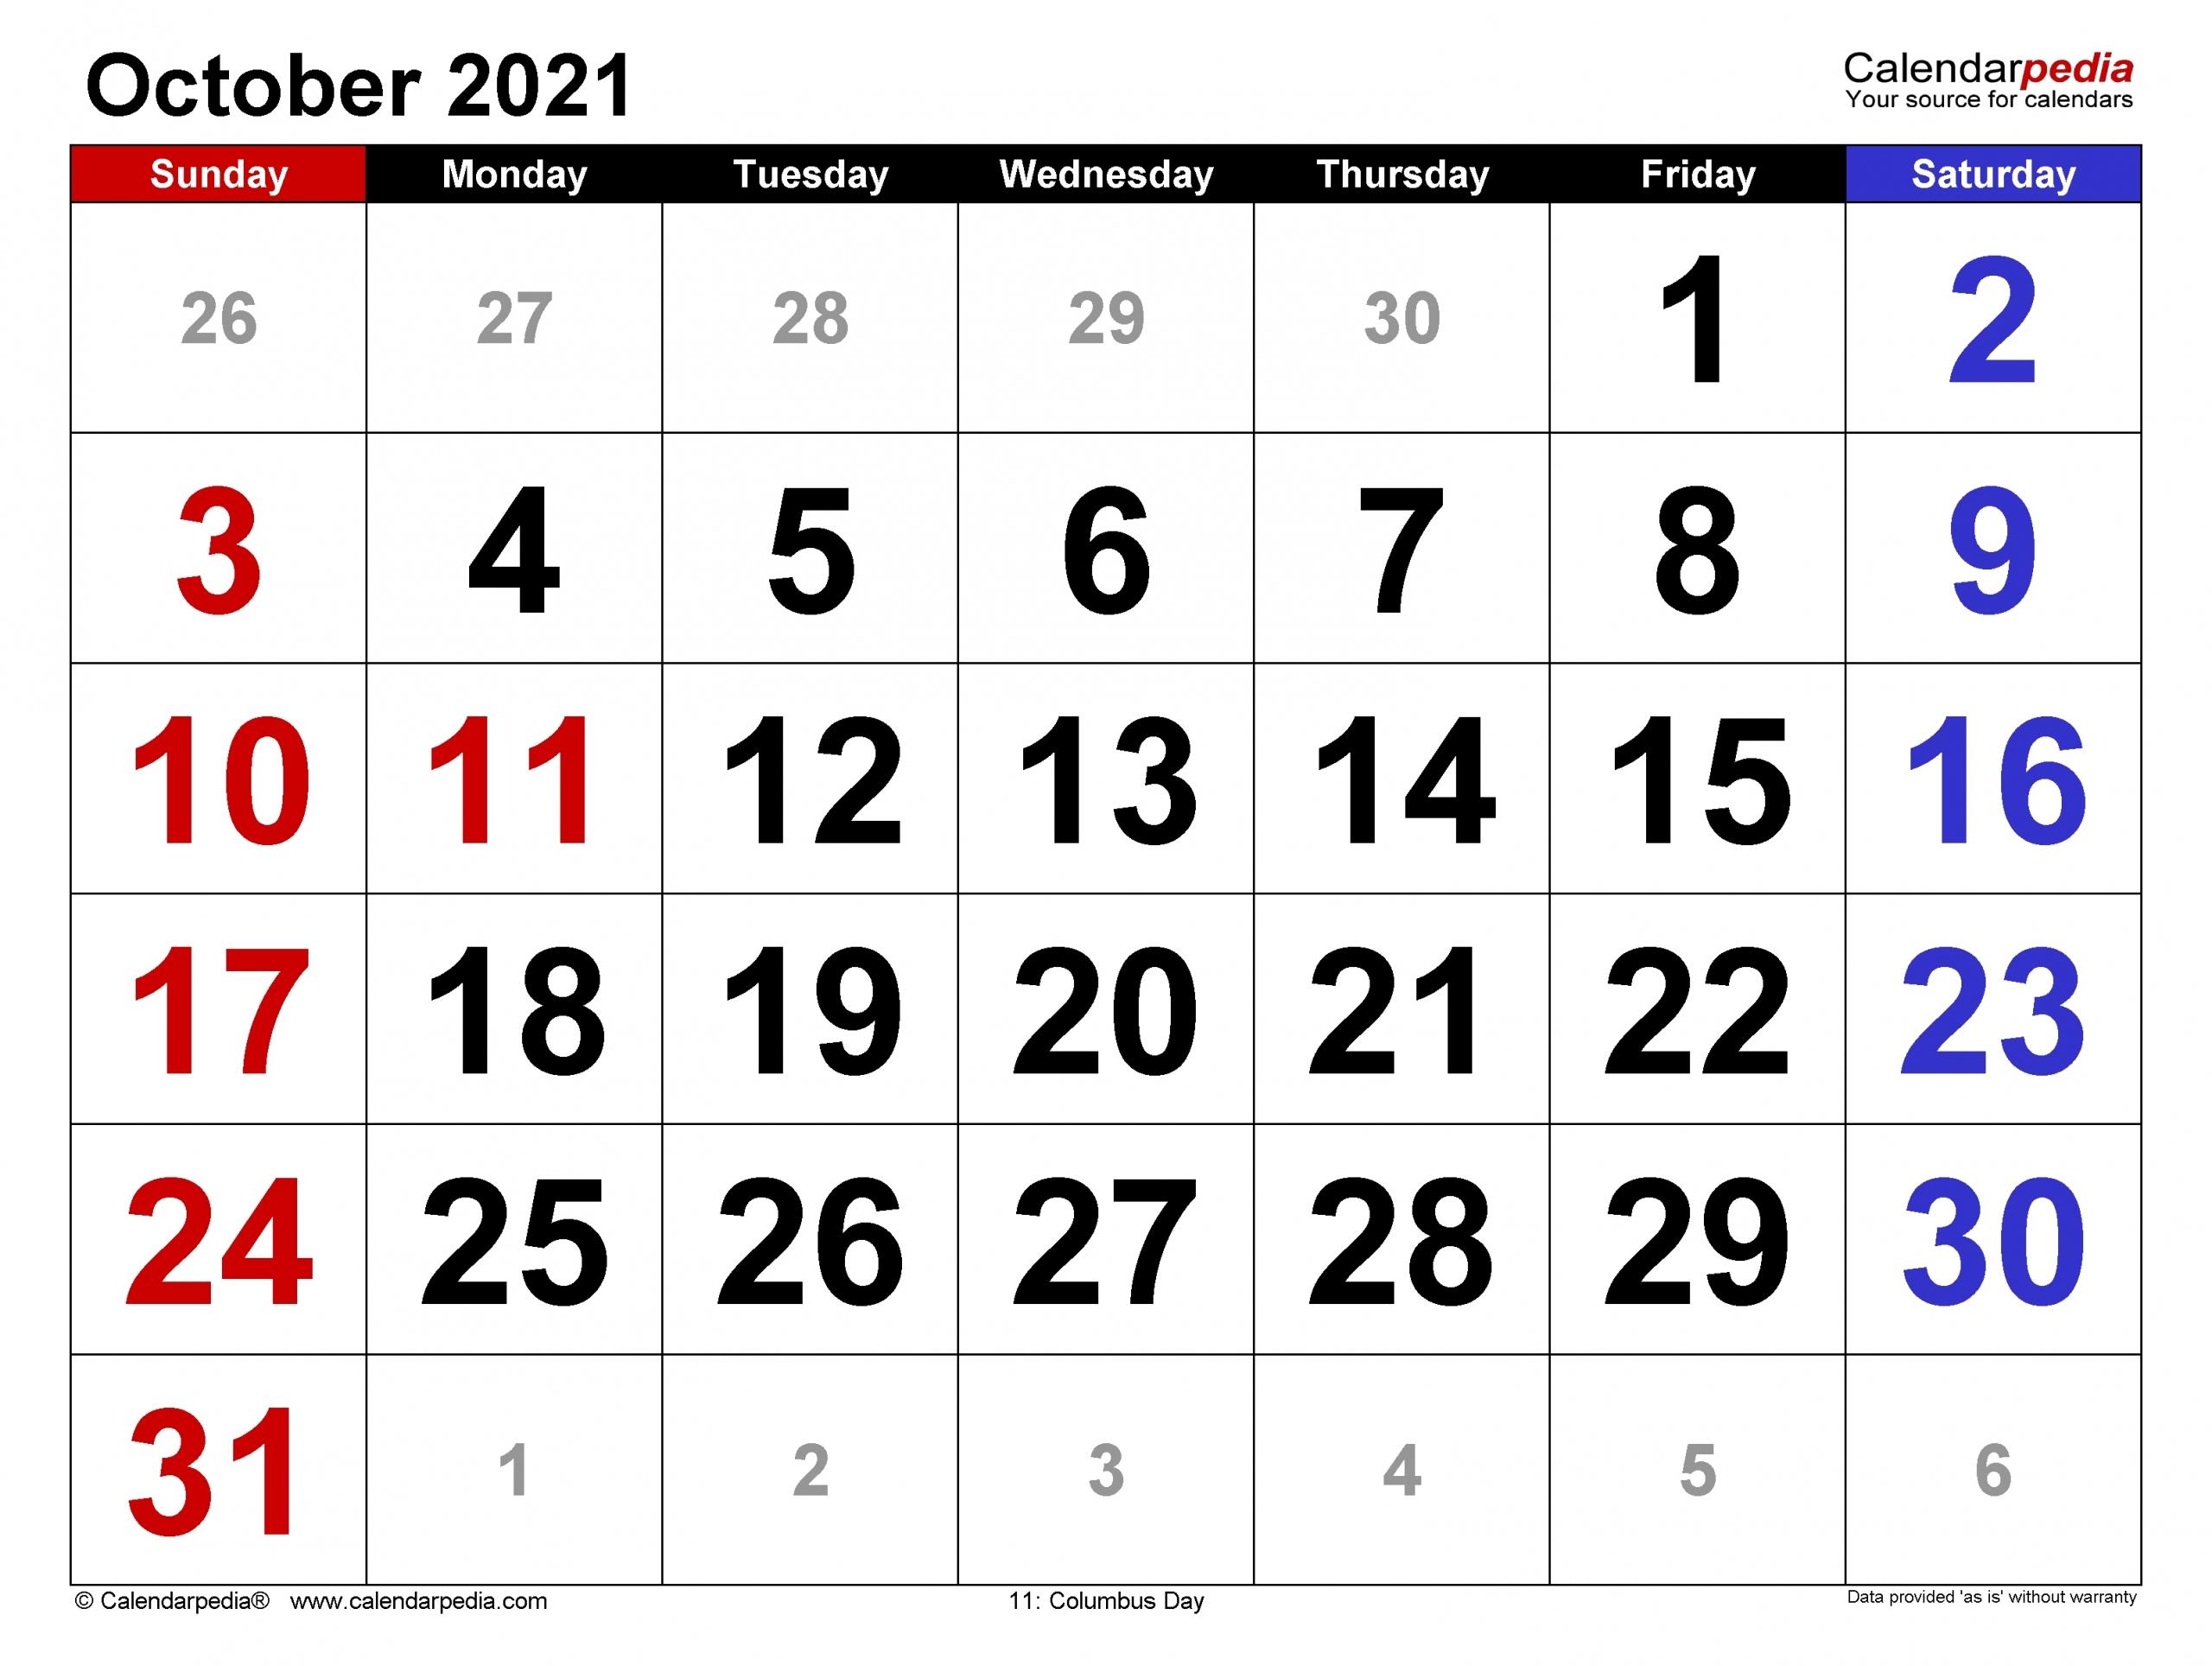 October Calendar 2021 | Month Calendar Printable October 2021 Calendar To Print